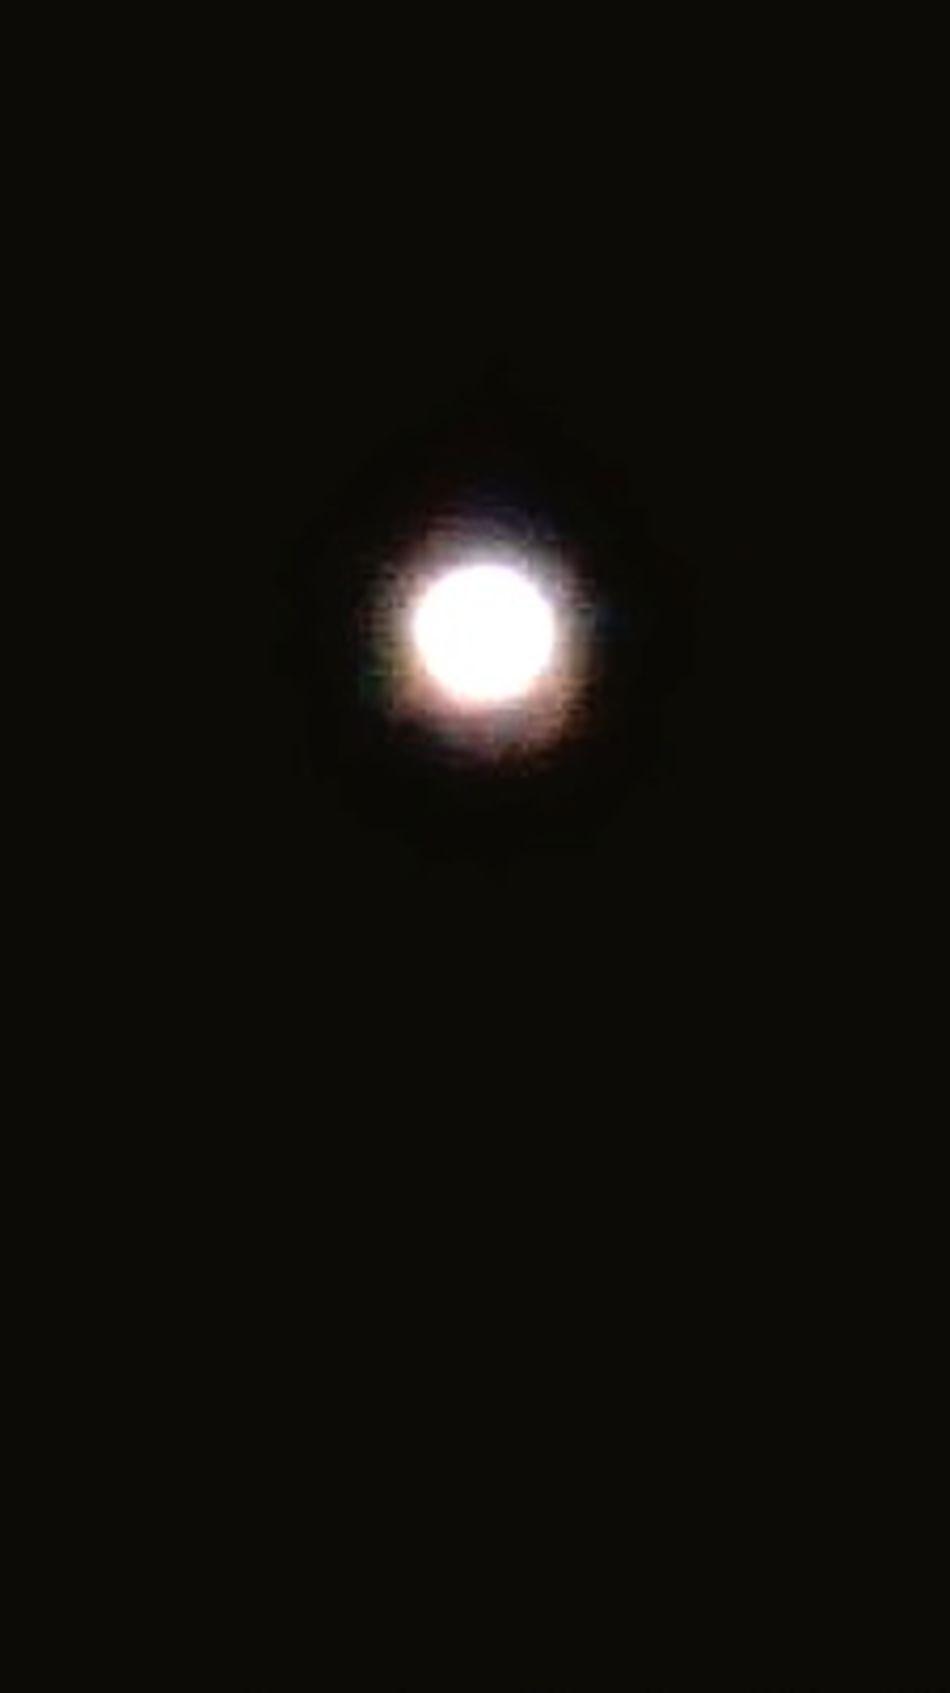 Moonlight Nightphotography EyeEm Best Shots